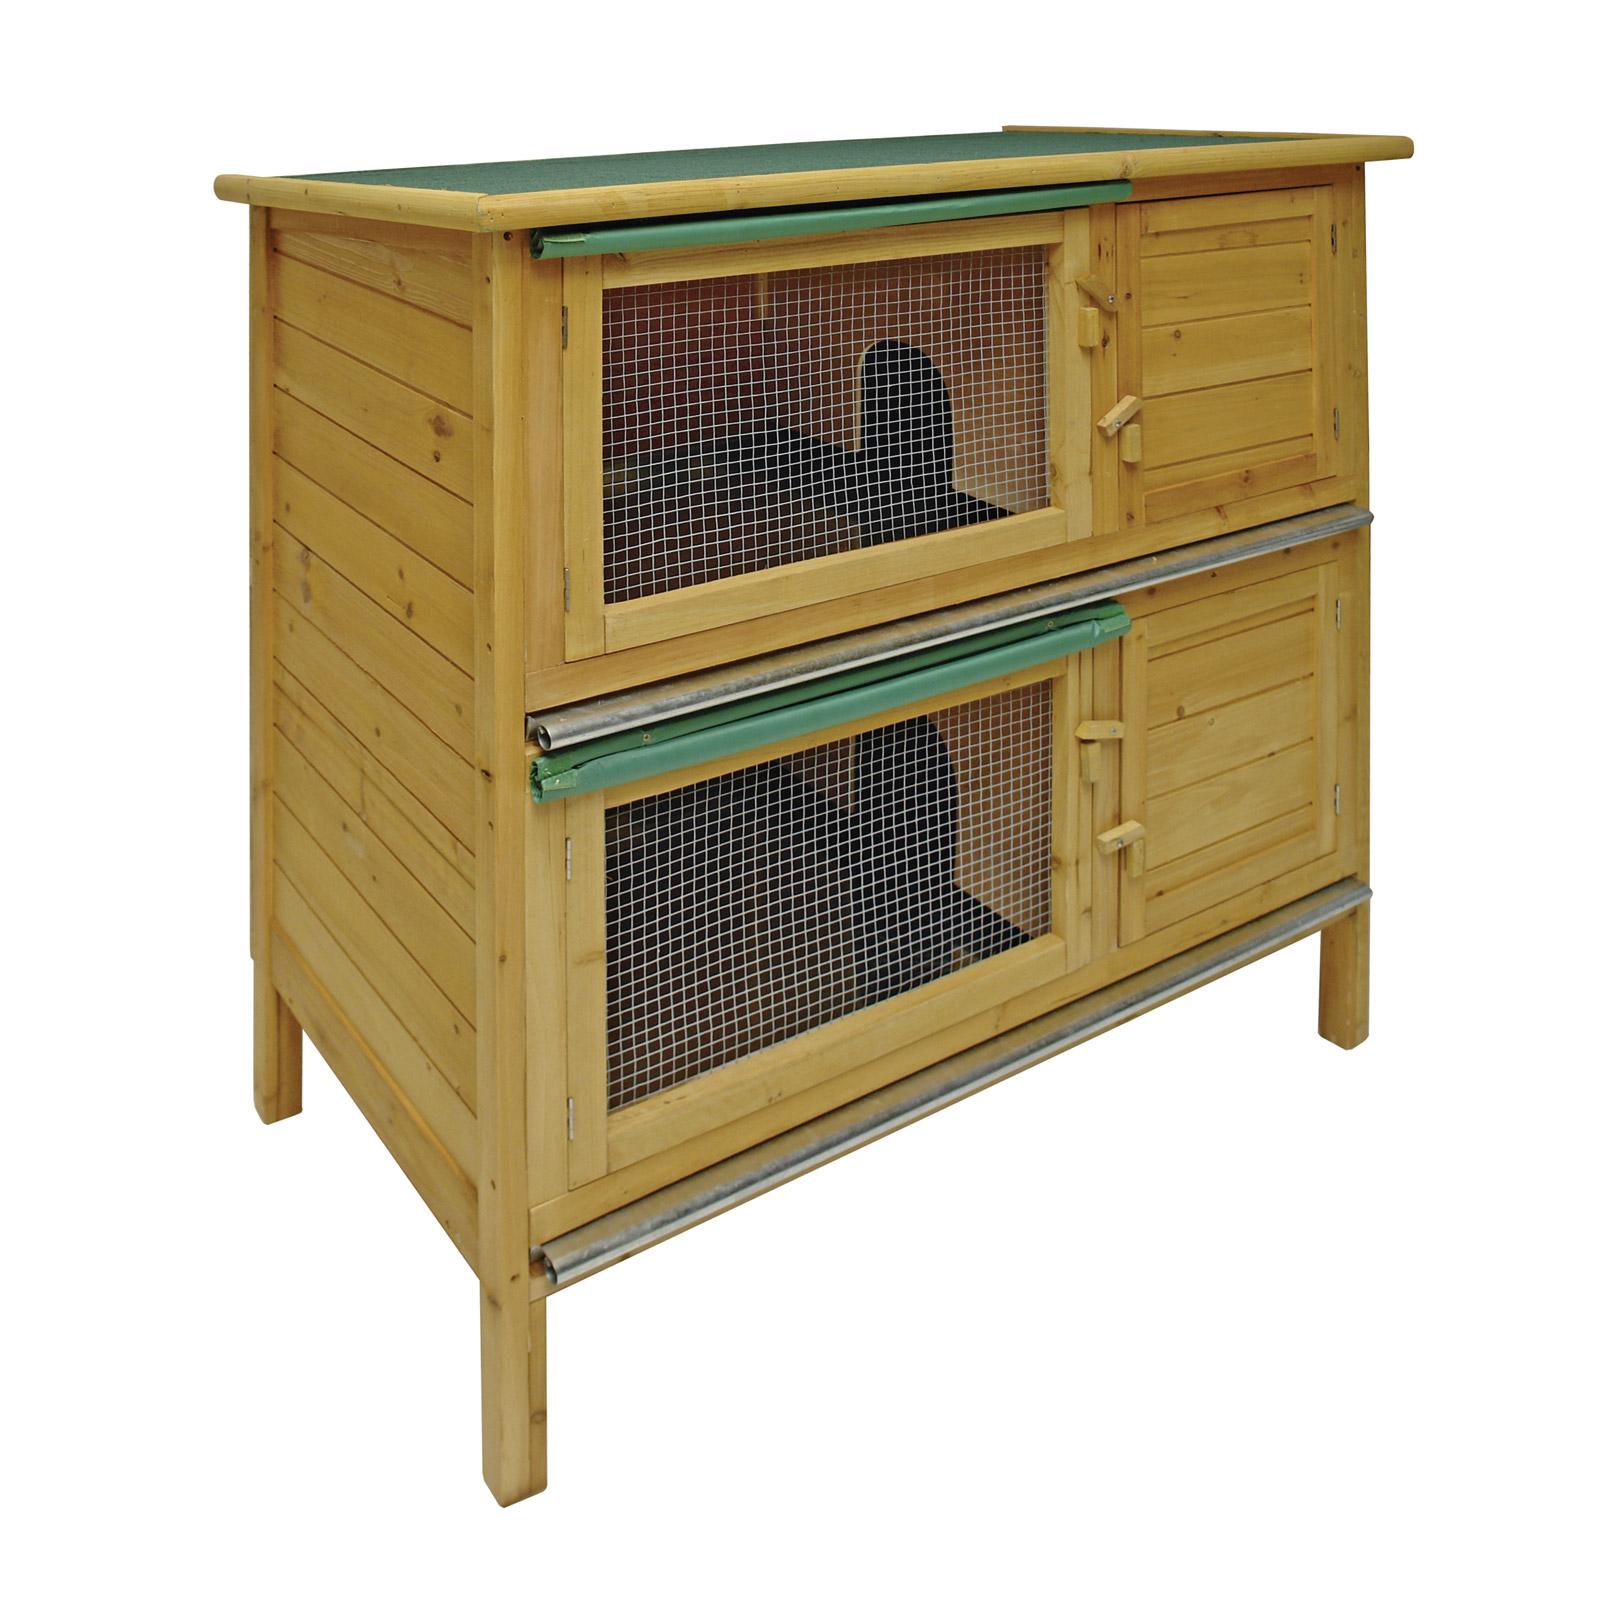 hasenstall double 2 kaninchenstall hasen 41232 ebay. Black Bedroom Furniture Sets. Home Design Ideas